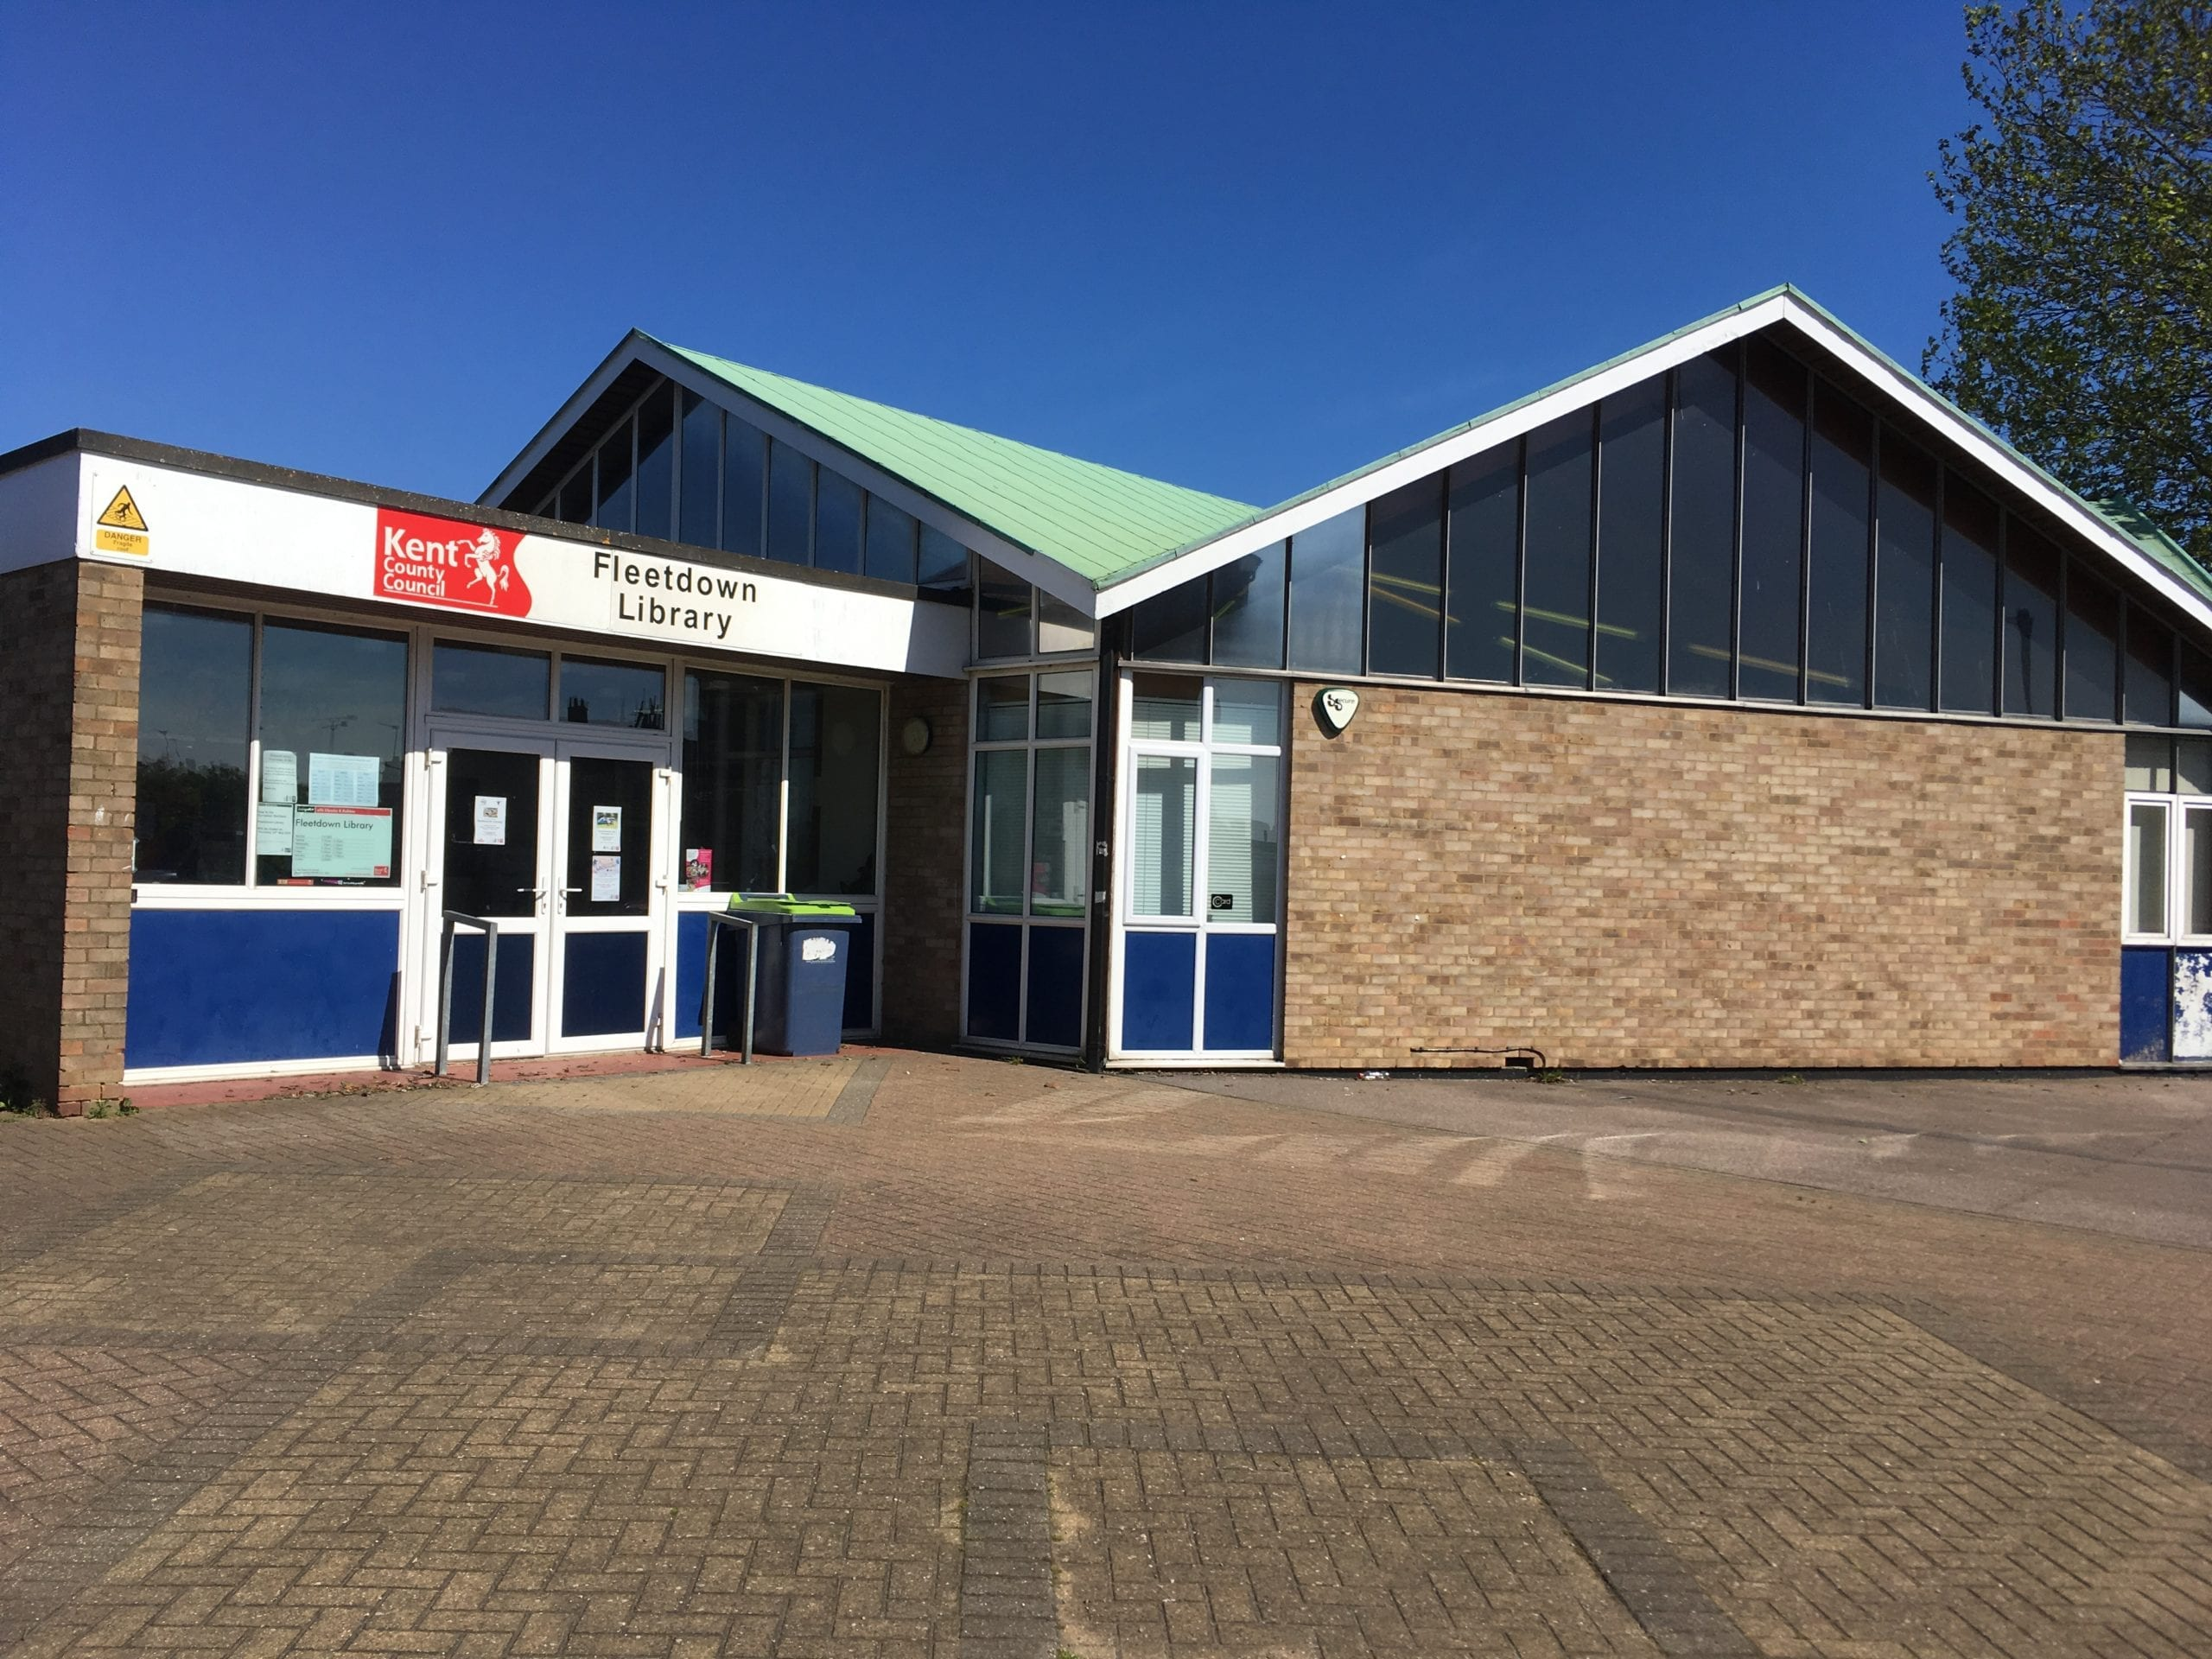 A photo of Fleetdown Library